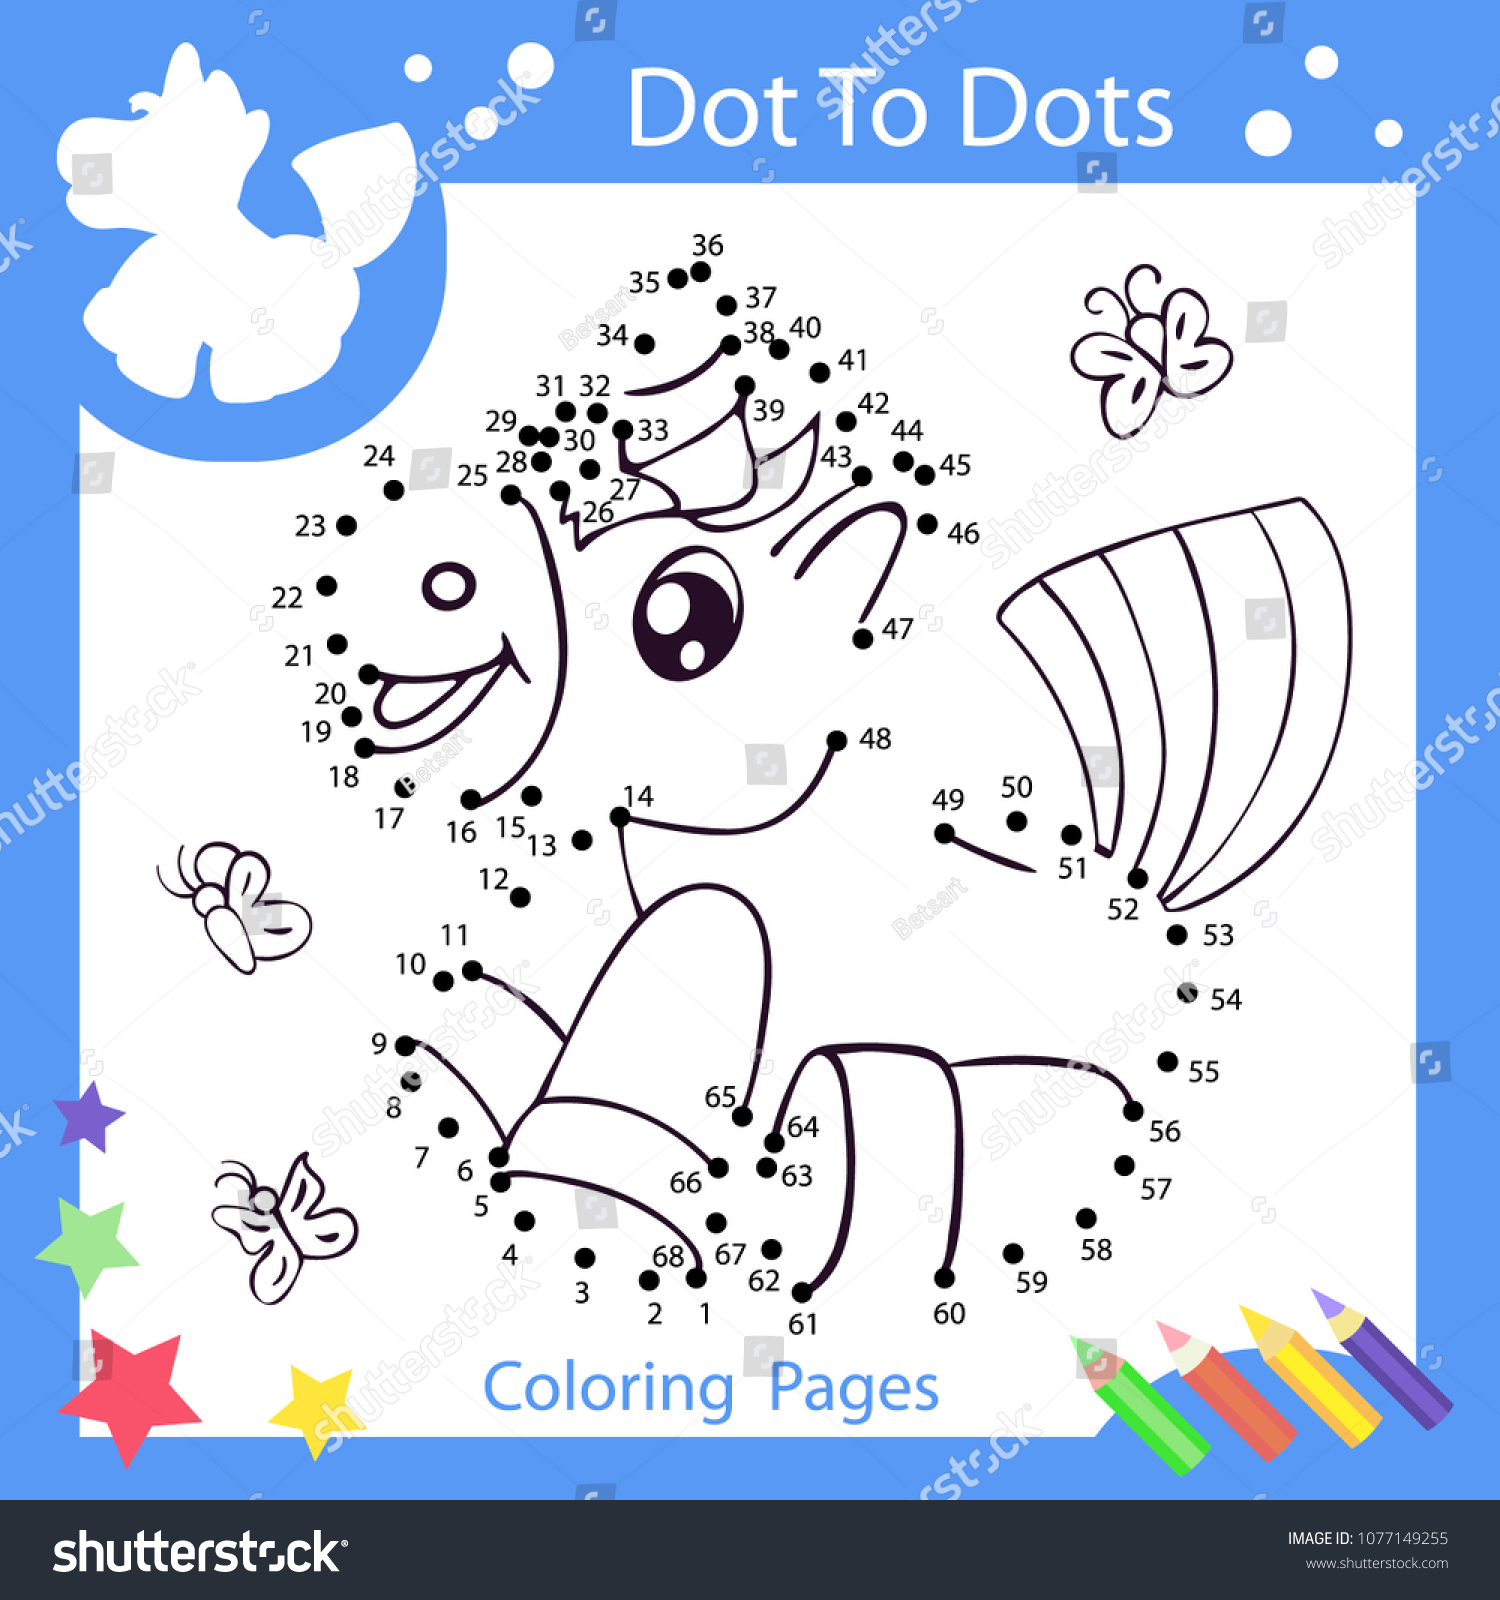 50 Dot To Dot For Kids Unicorn